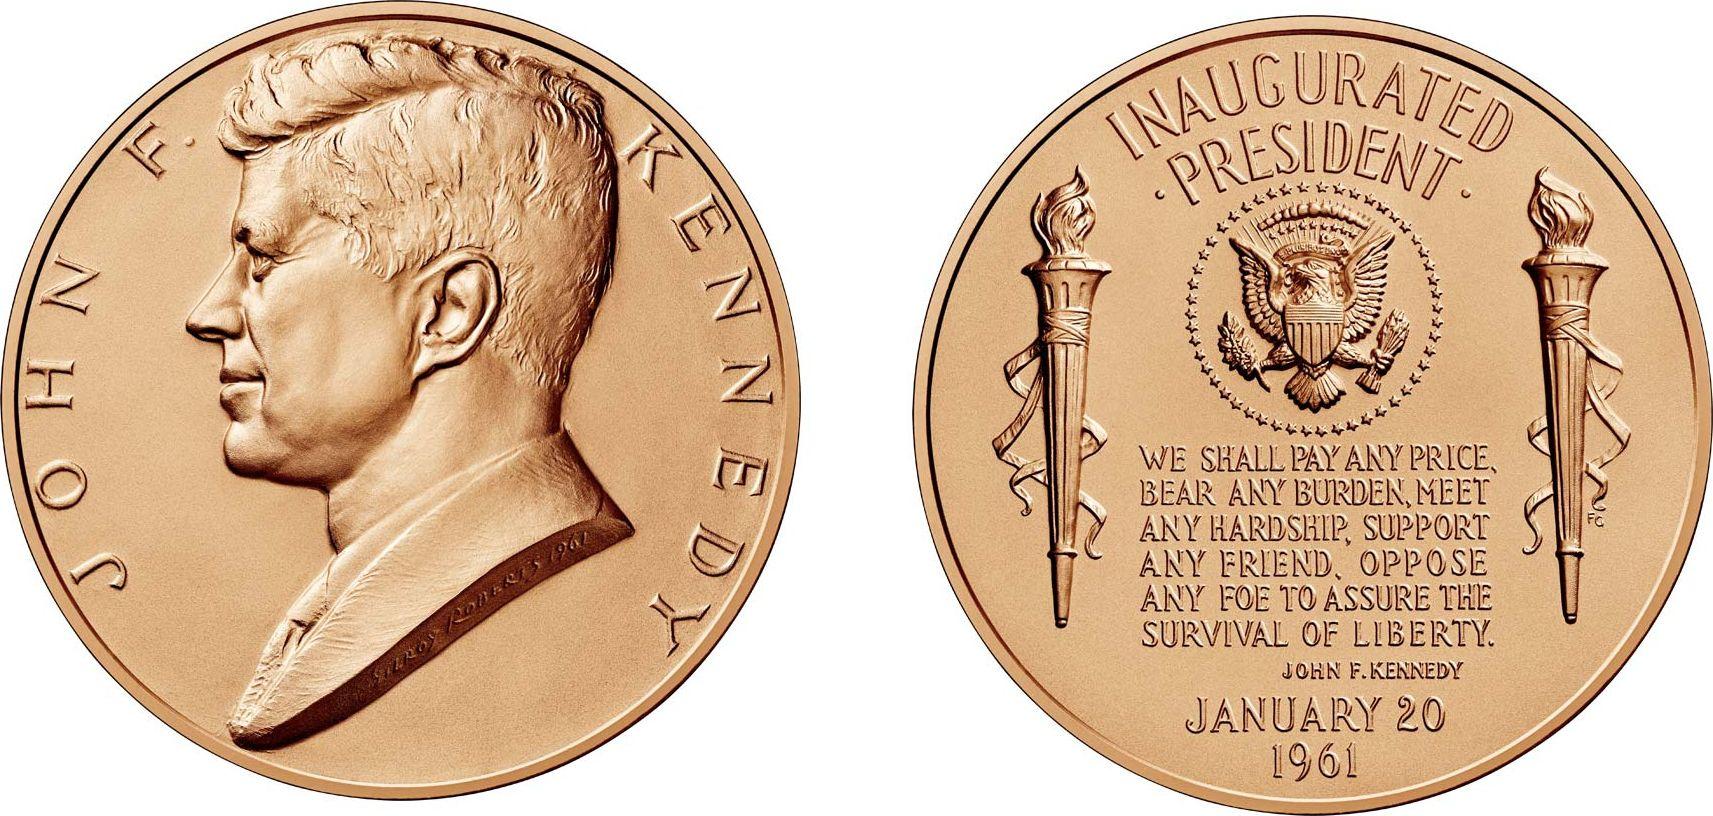 USA Presidential bronze medal - JF Kennedy  - U.S. Mint